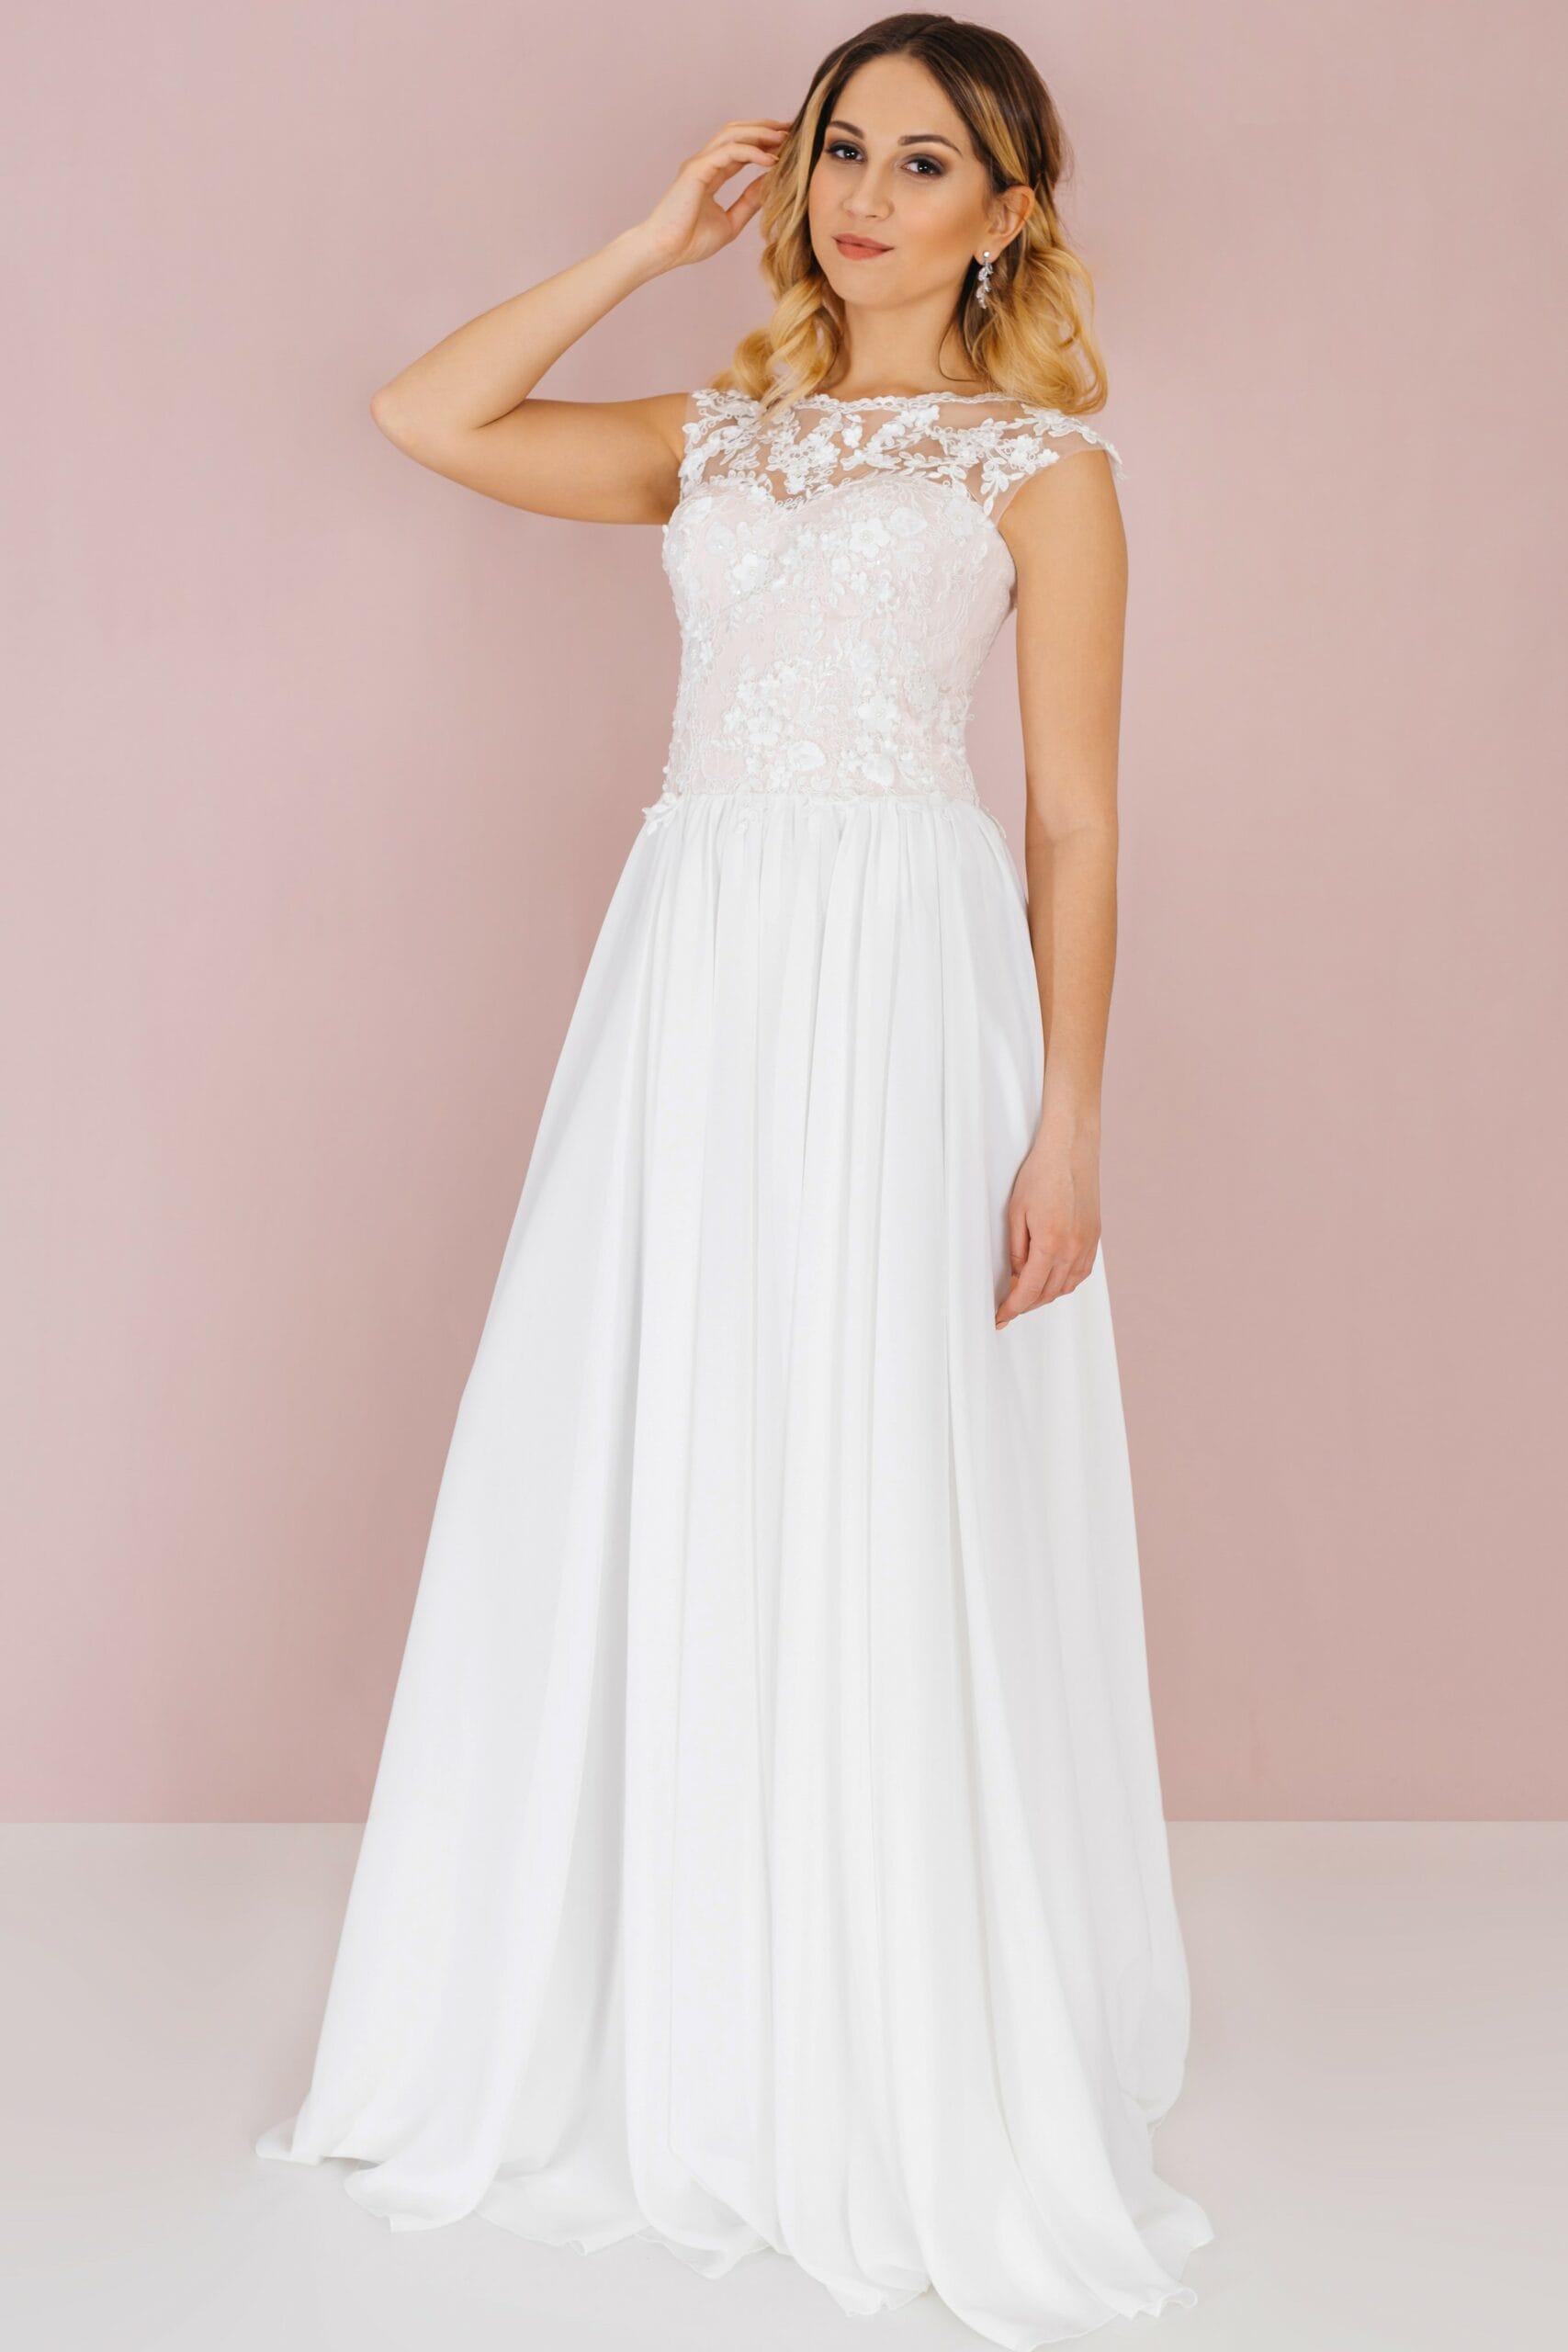 Свадебное платье SOPHIA, коллекция LOFT, бренд RARE BRIDAL, фото 1